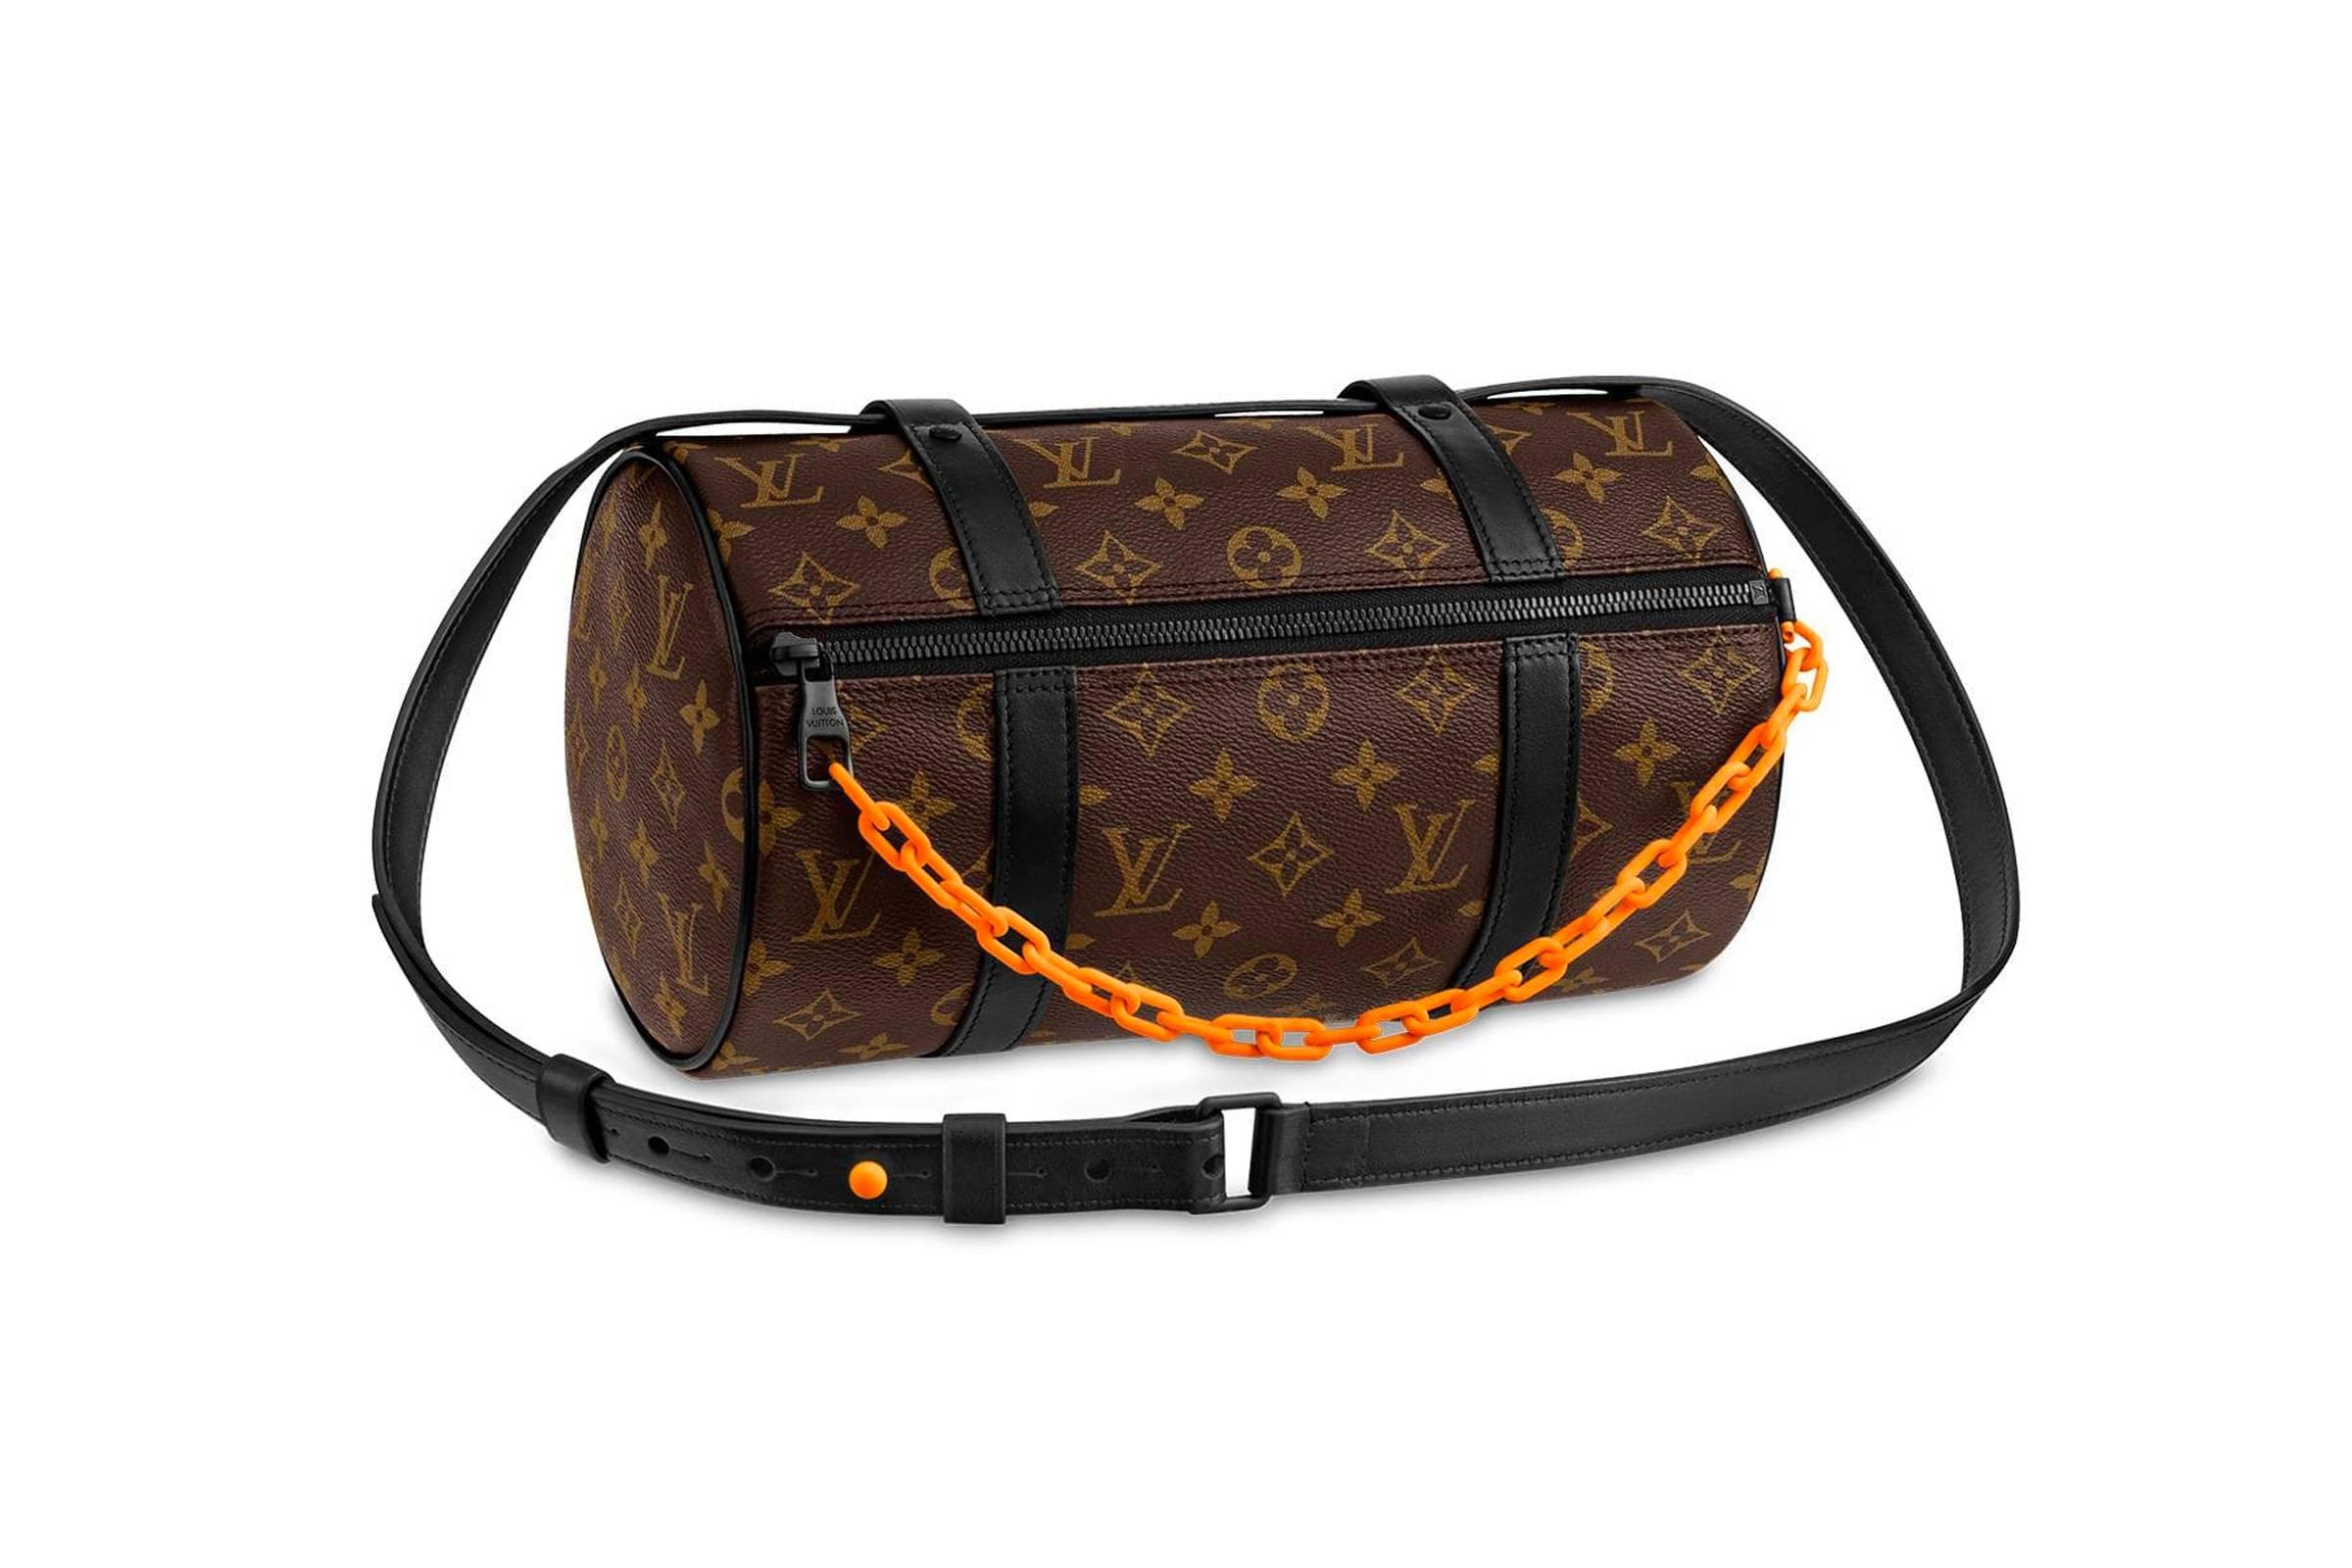 Louis Vuitton Papillon Messenger Bag